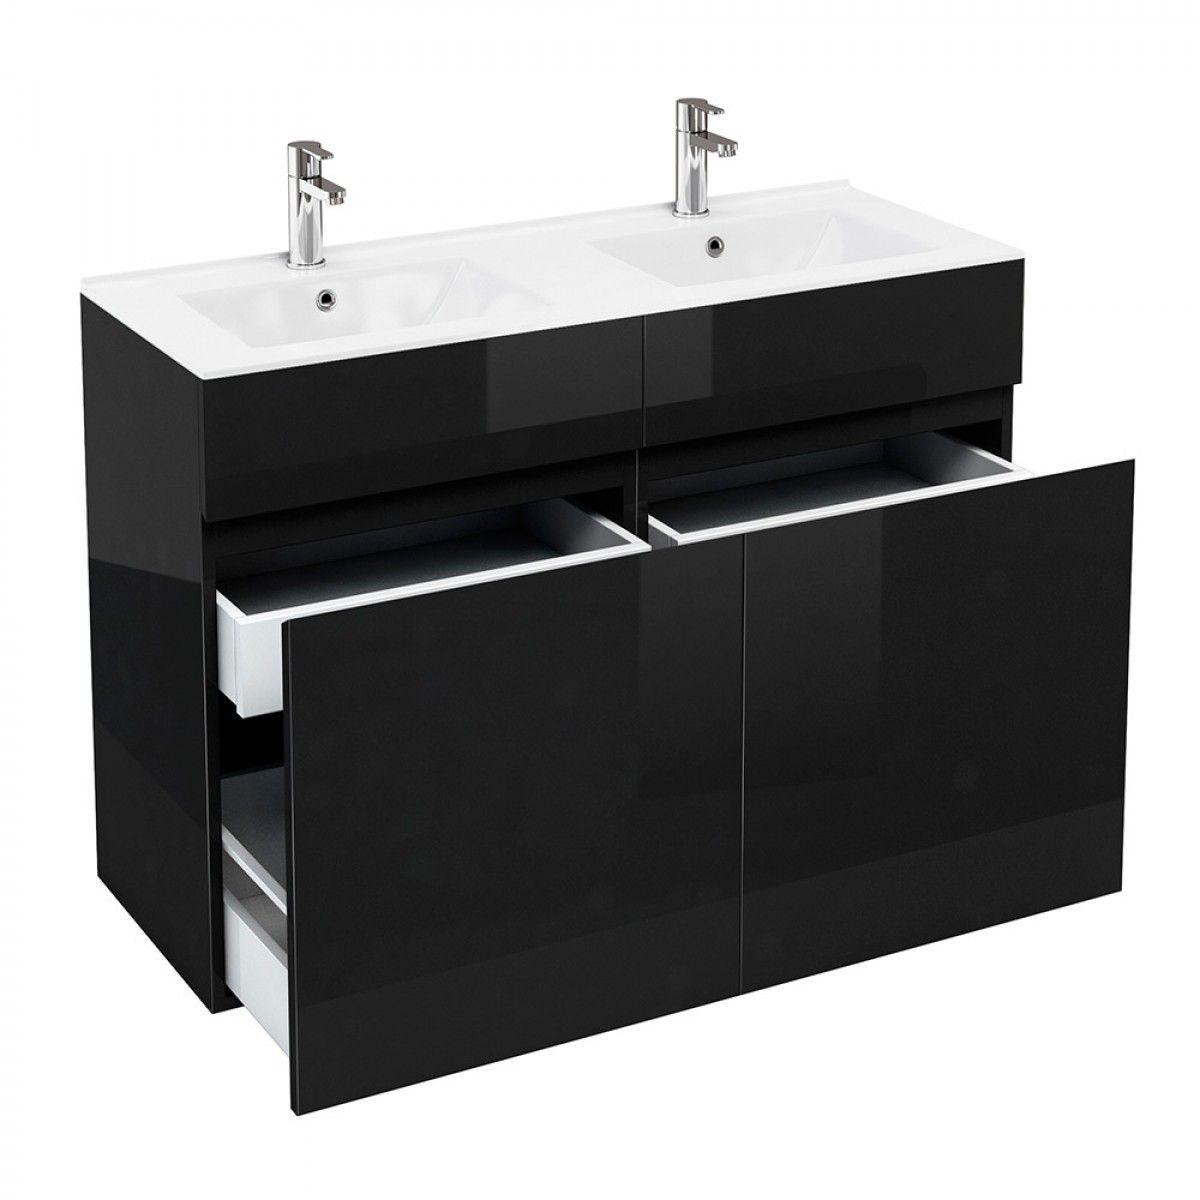 Contemporary Floor Standing Vanity Unit With Either A Quattrocast Or Ceramic Basin Beautiful Black Vanity Units Bathroom Furniture Vanity Bathroom Vanity Units